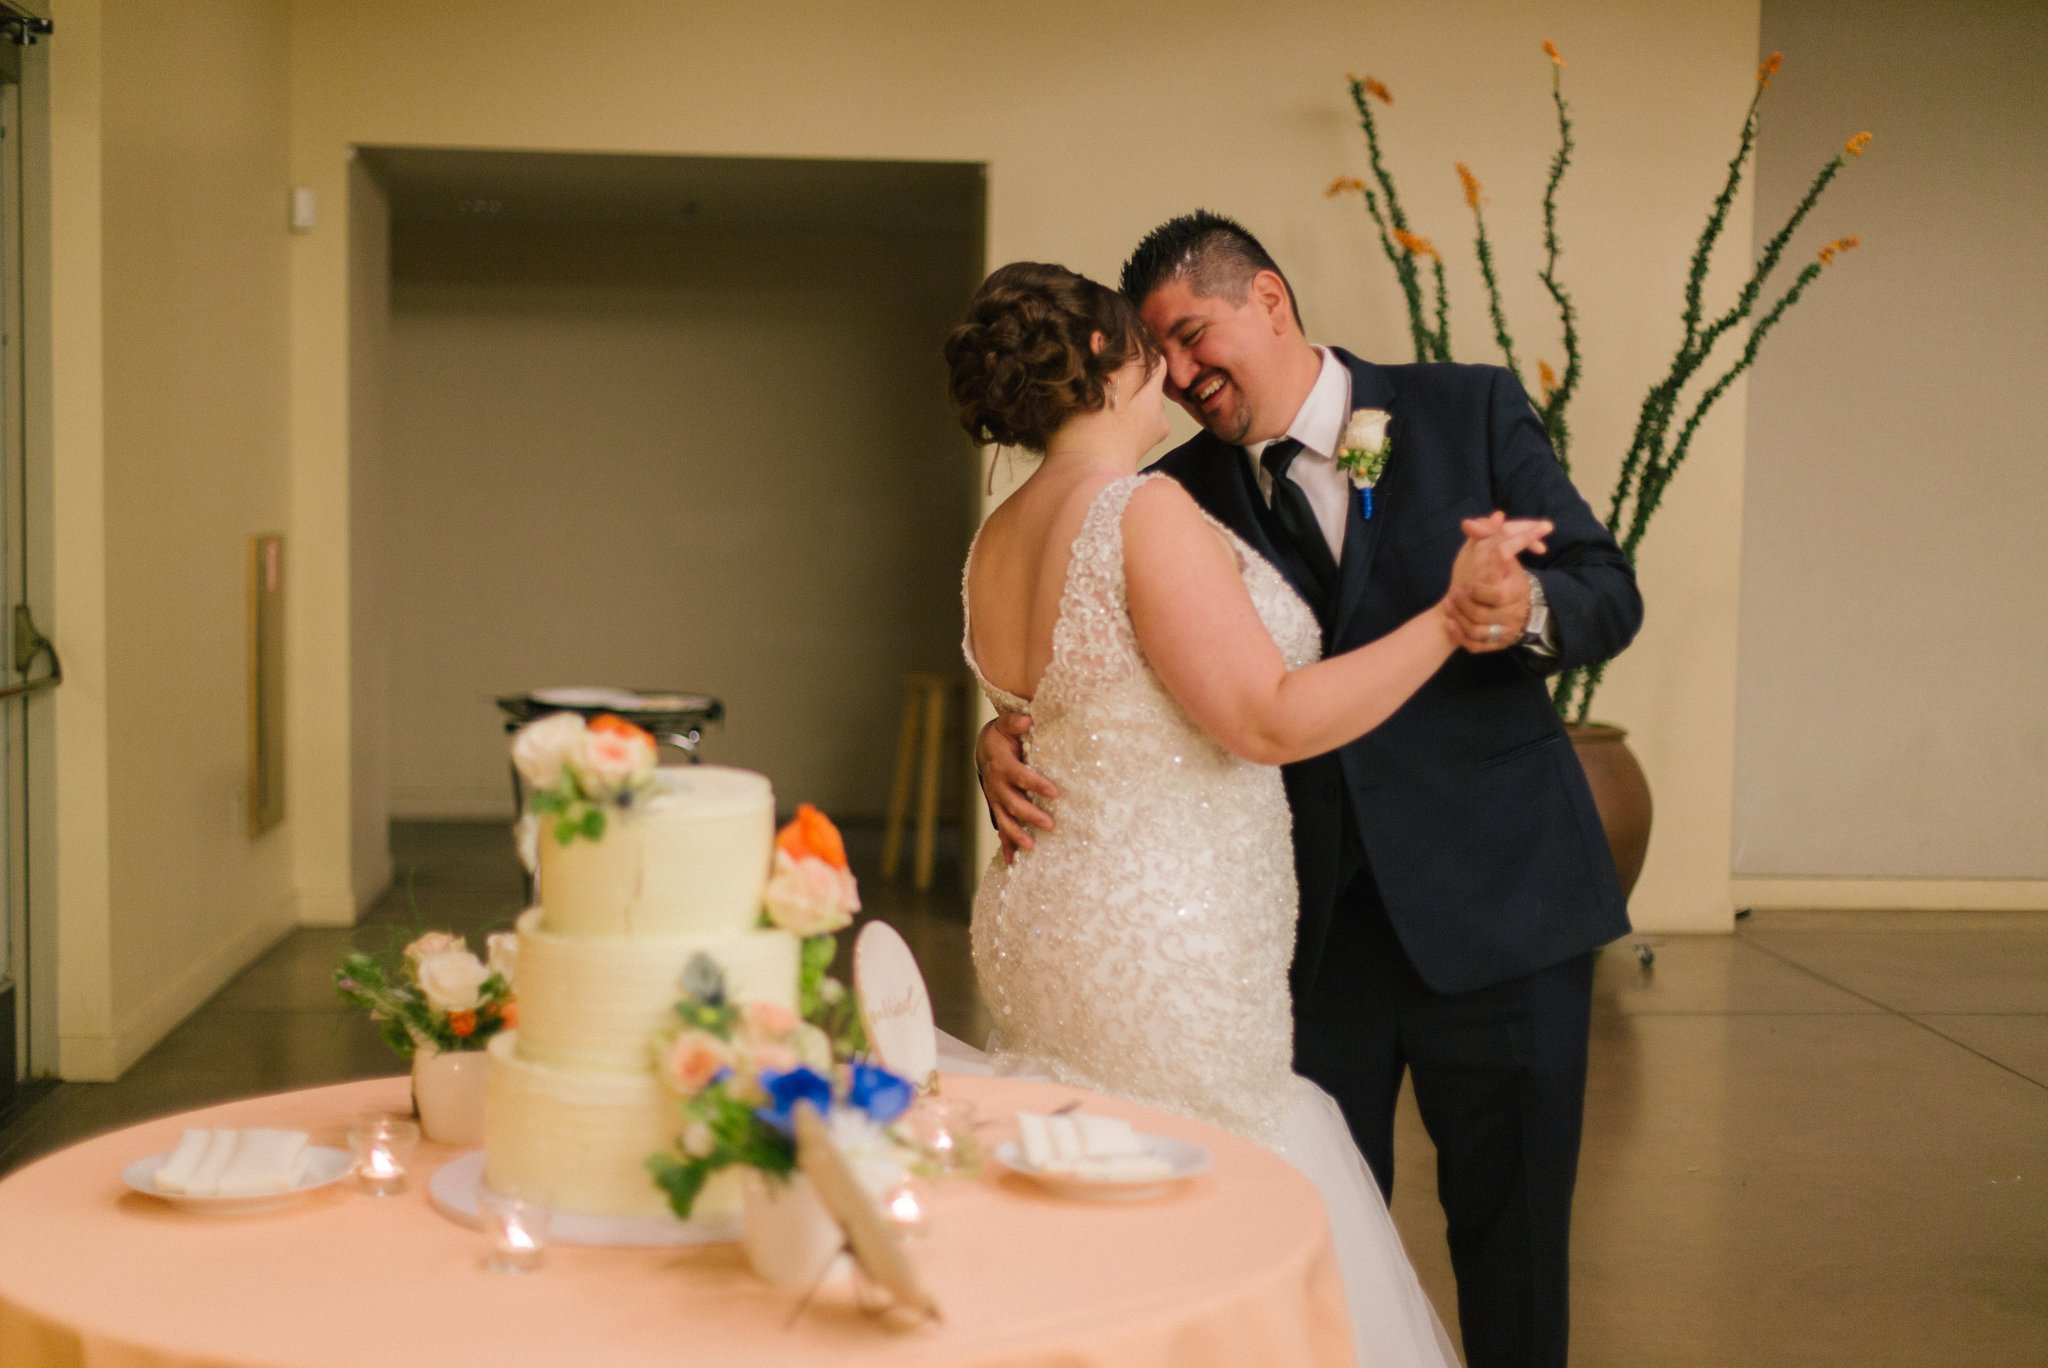 Desert Botanical Gardens reception bride and groom cake cutting